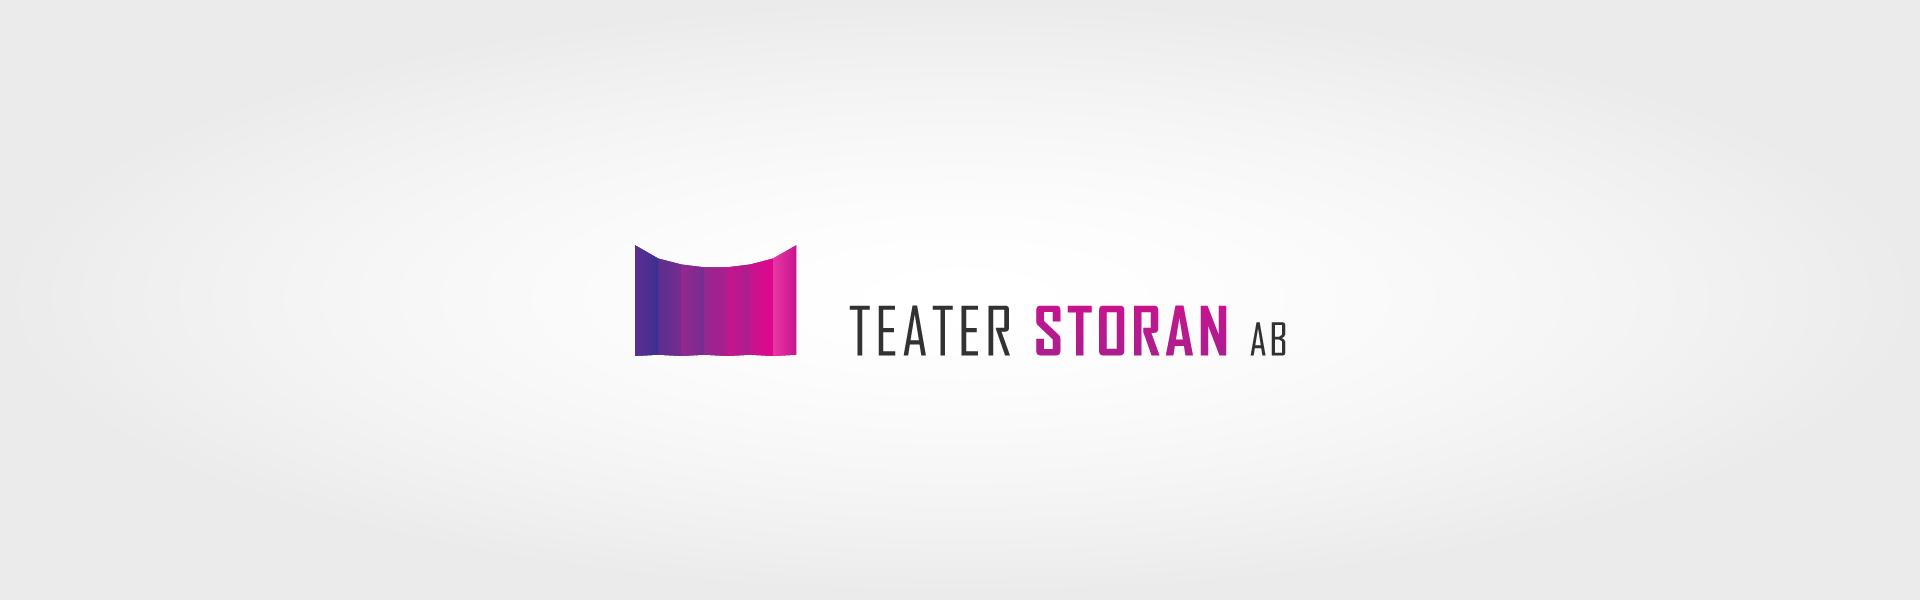 teater-storan-ab_slider_low